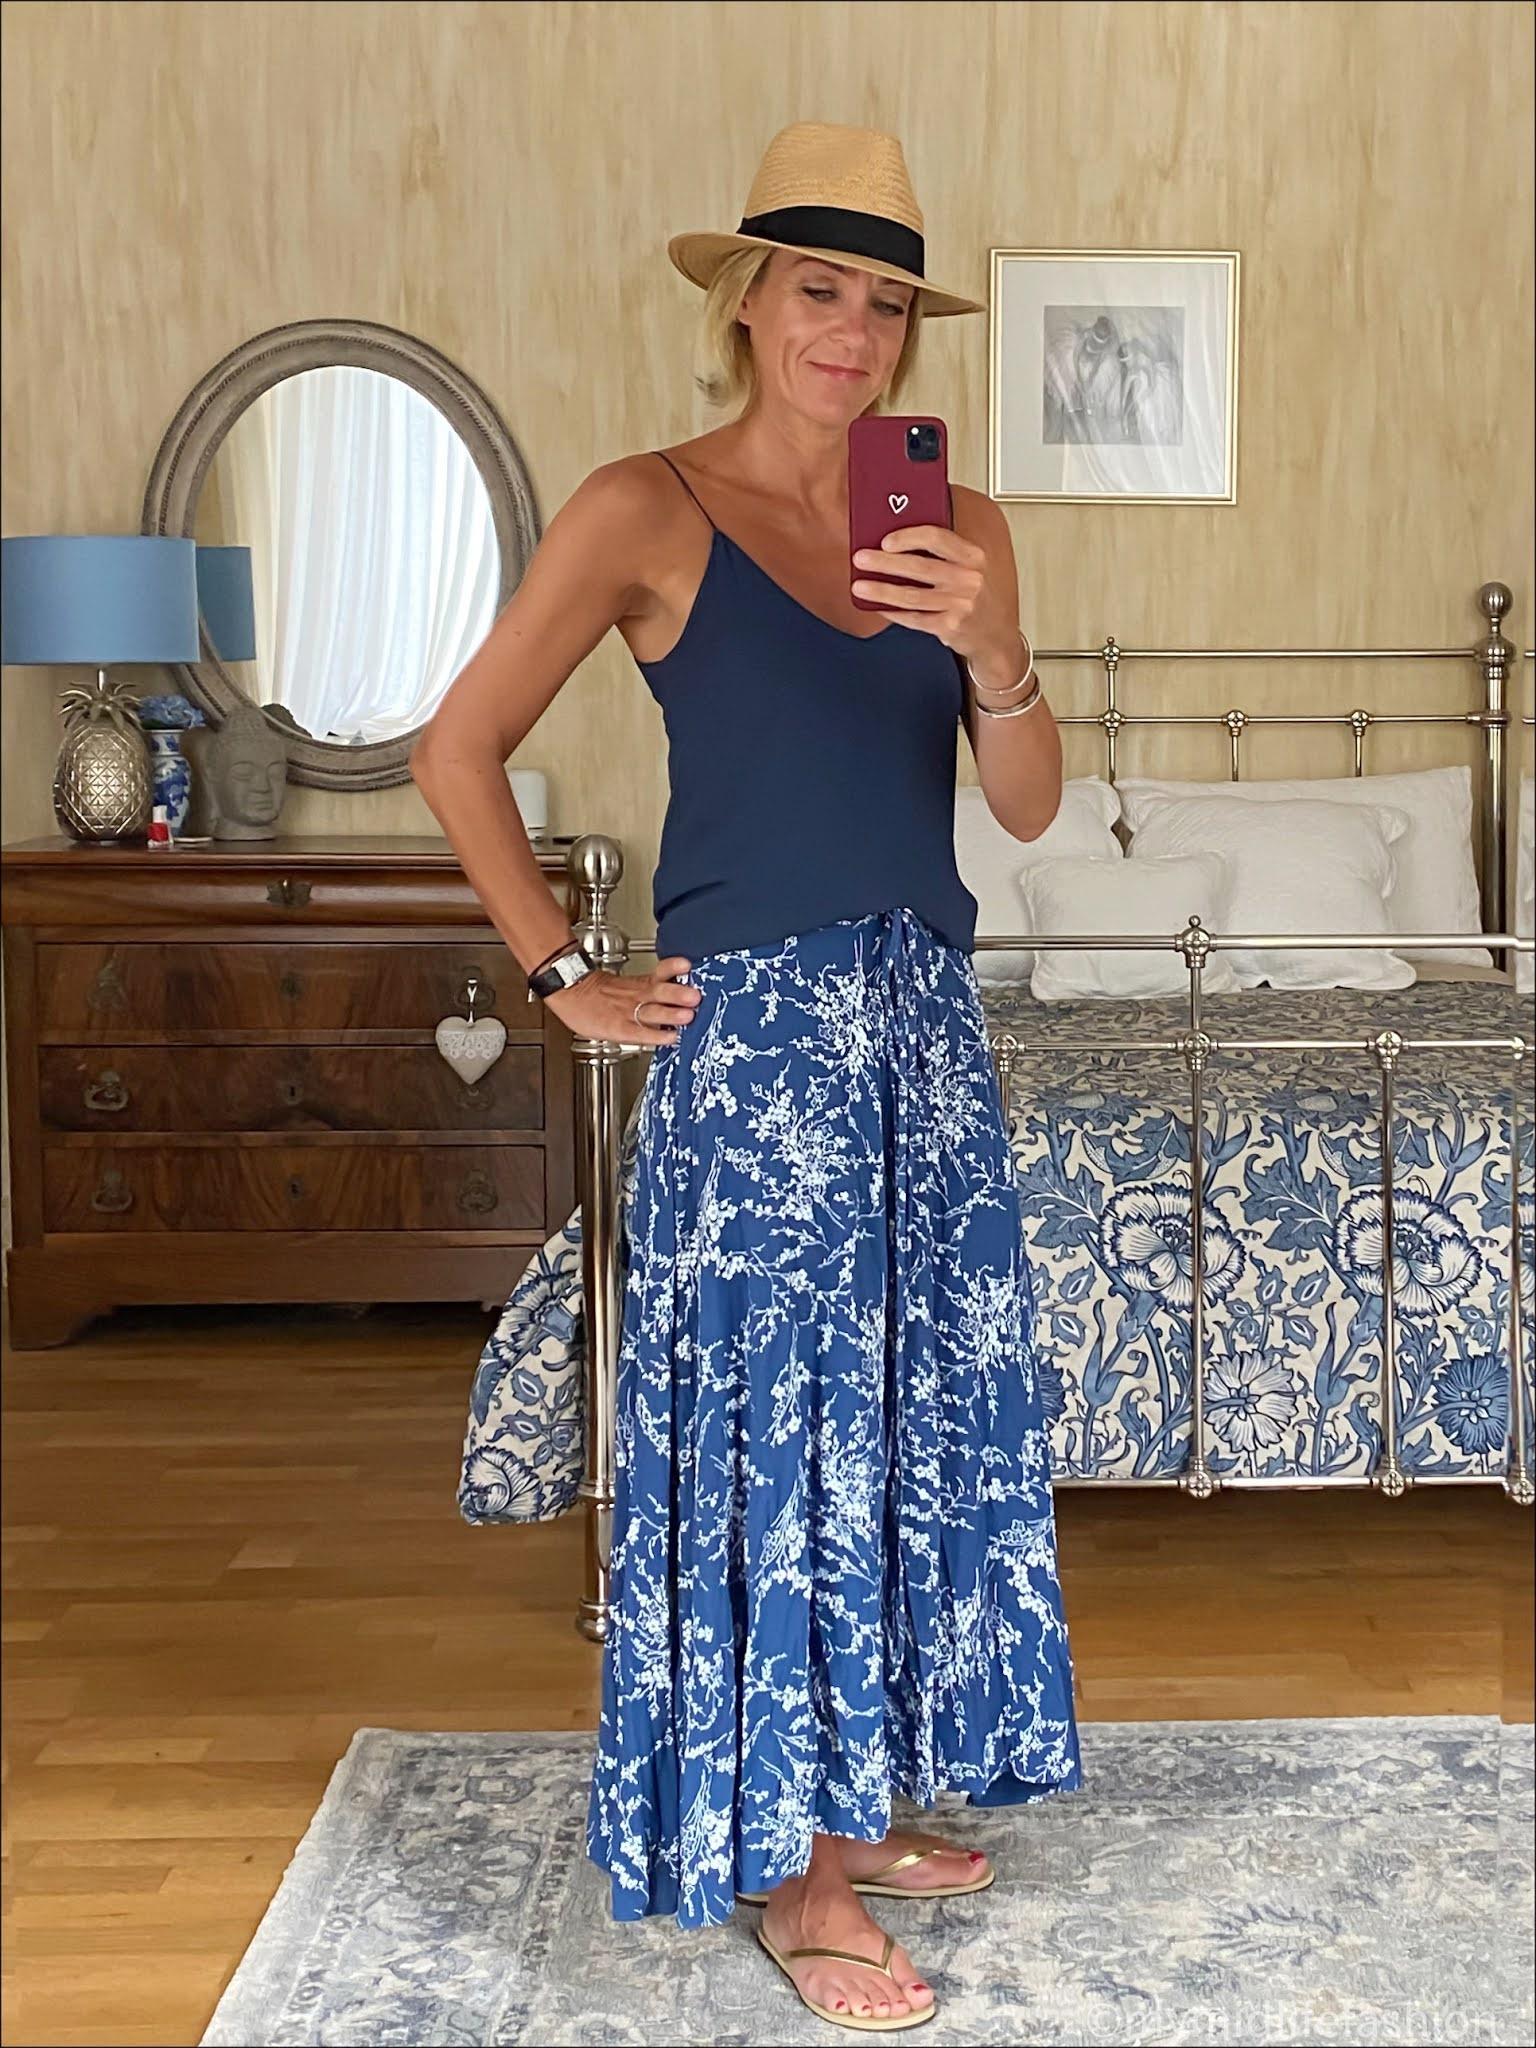 my midlife fashion, H&M Panama hat, Zara camisole top, floral midi skirt, gold slim fit havaianas